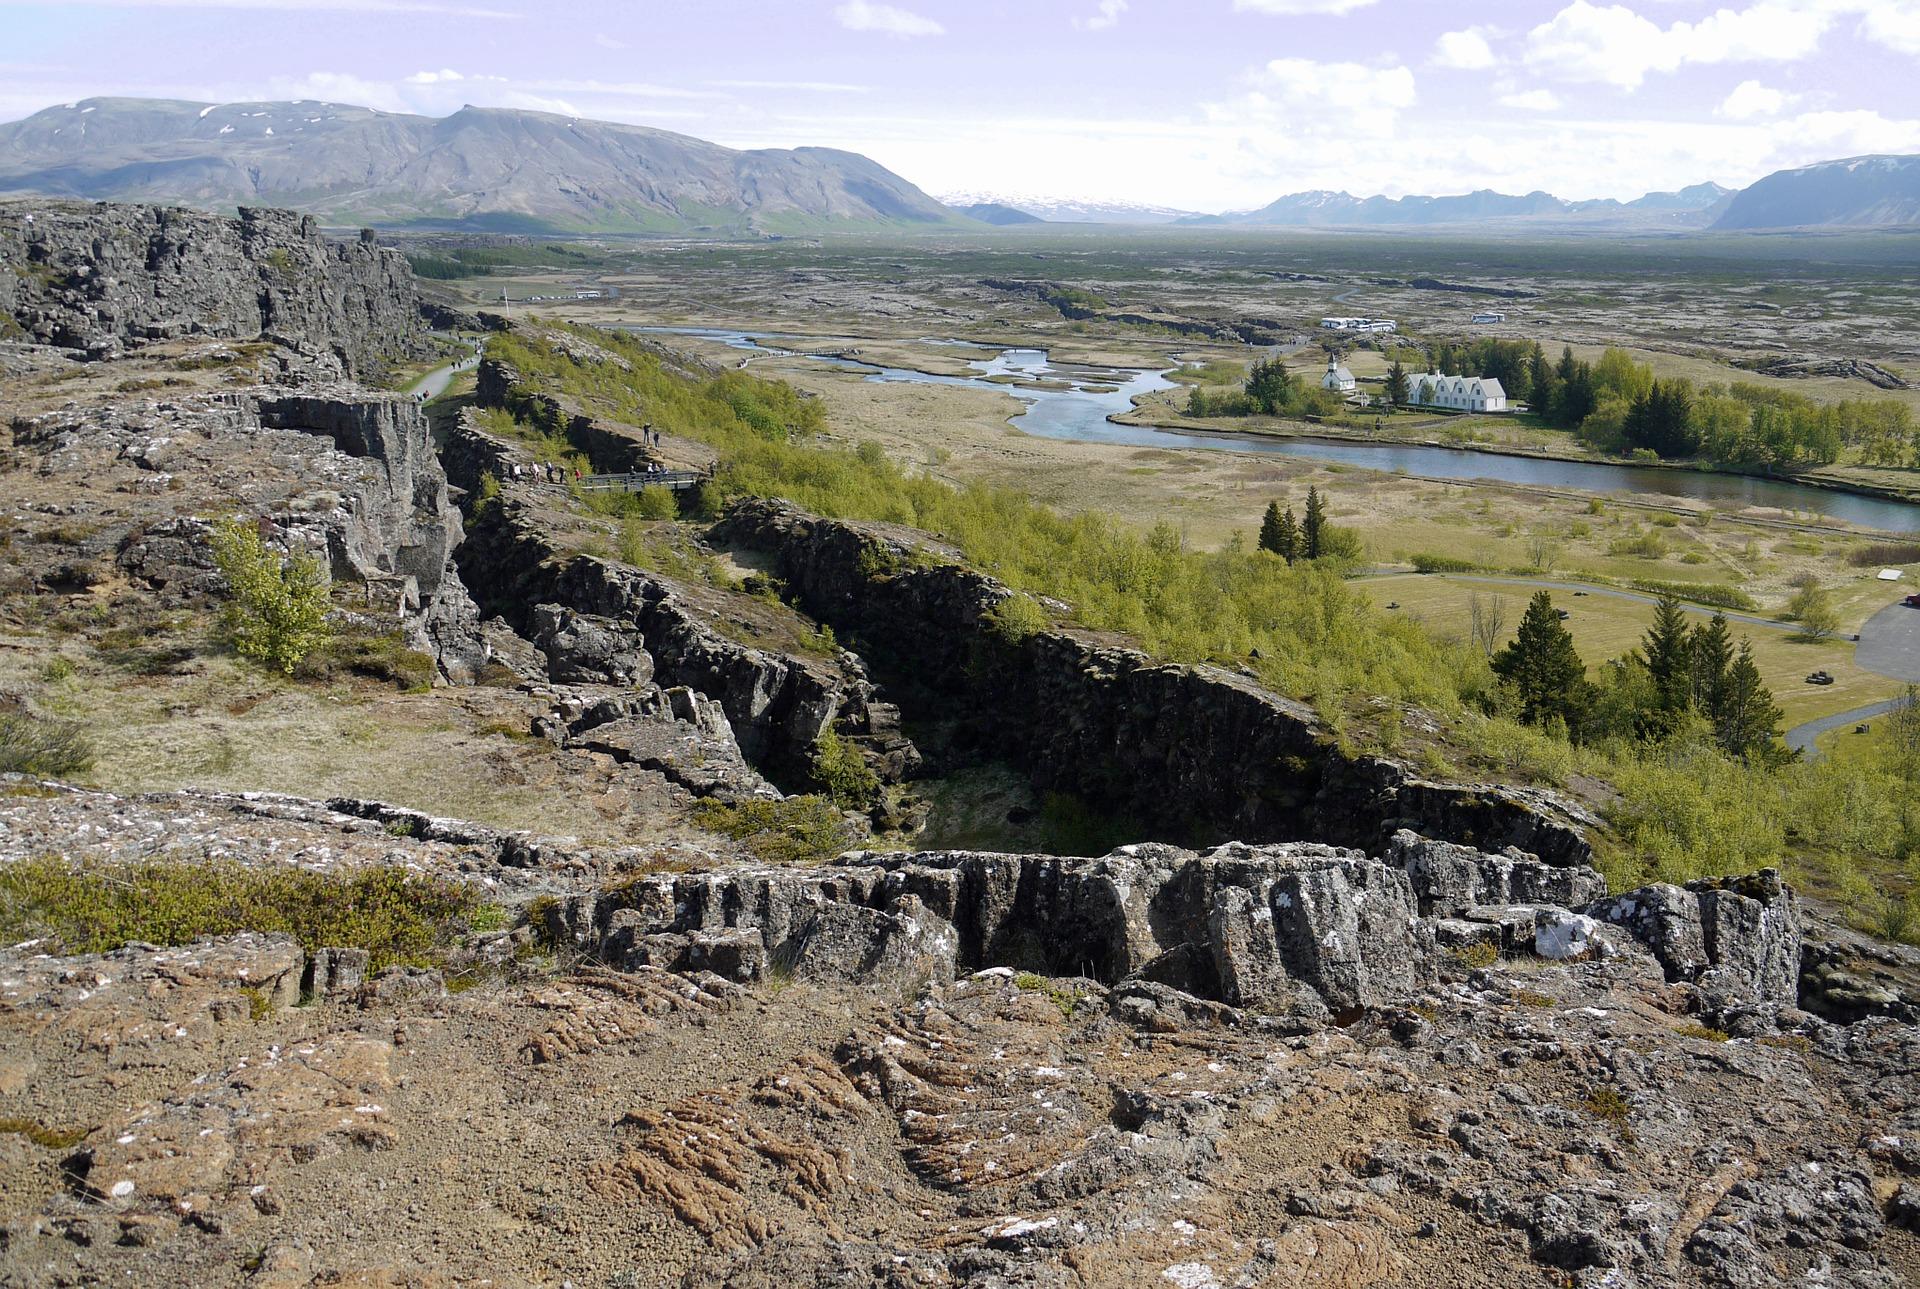 Elevated view of Þingvellir (Thingvellir) in southwestern Iceland. Image source: www.pixabay.com